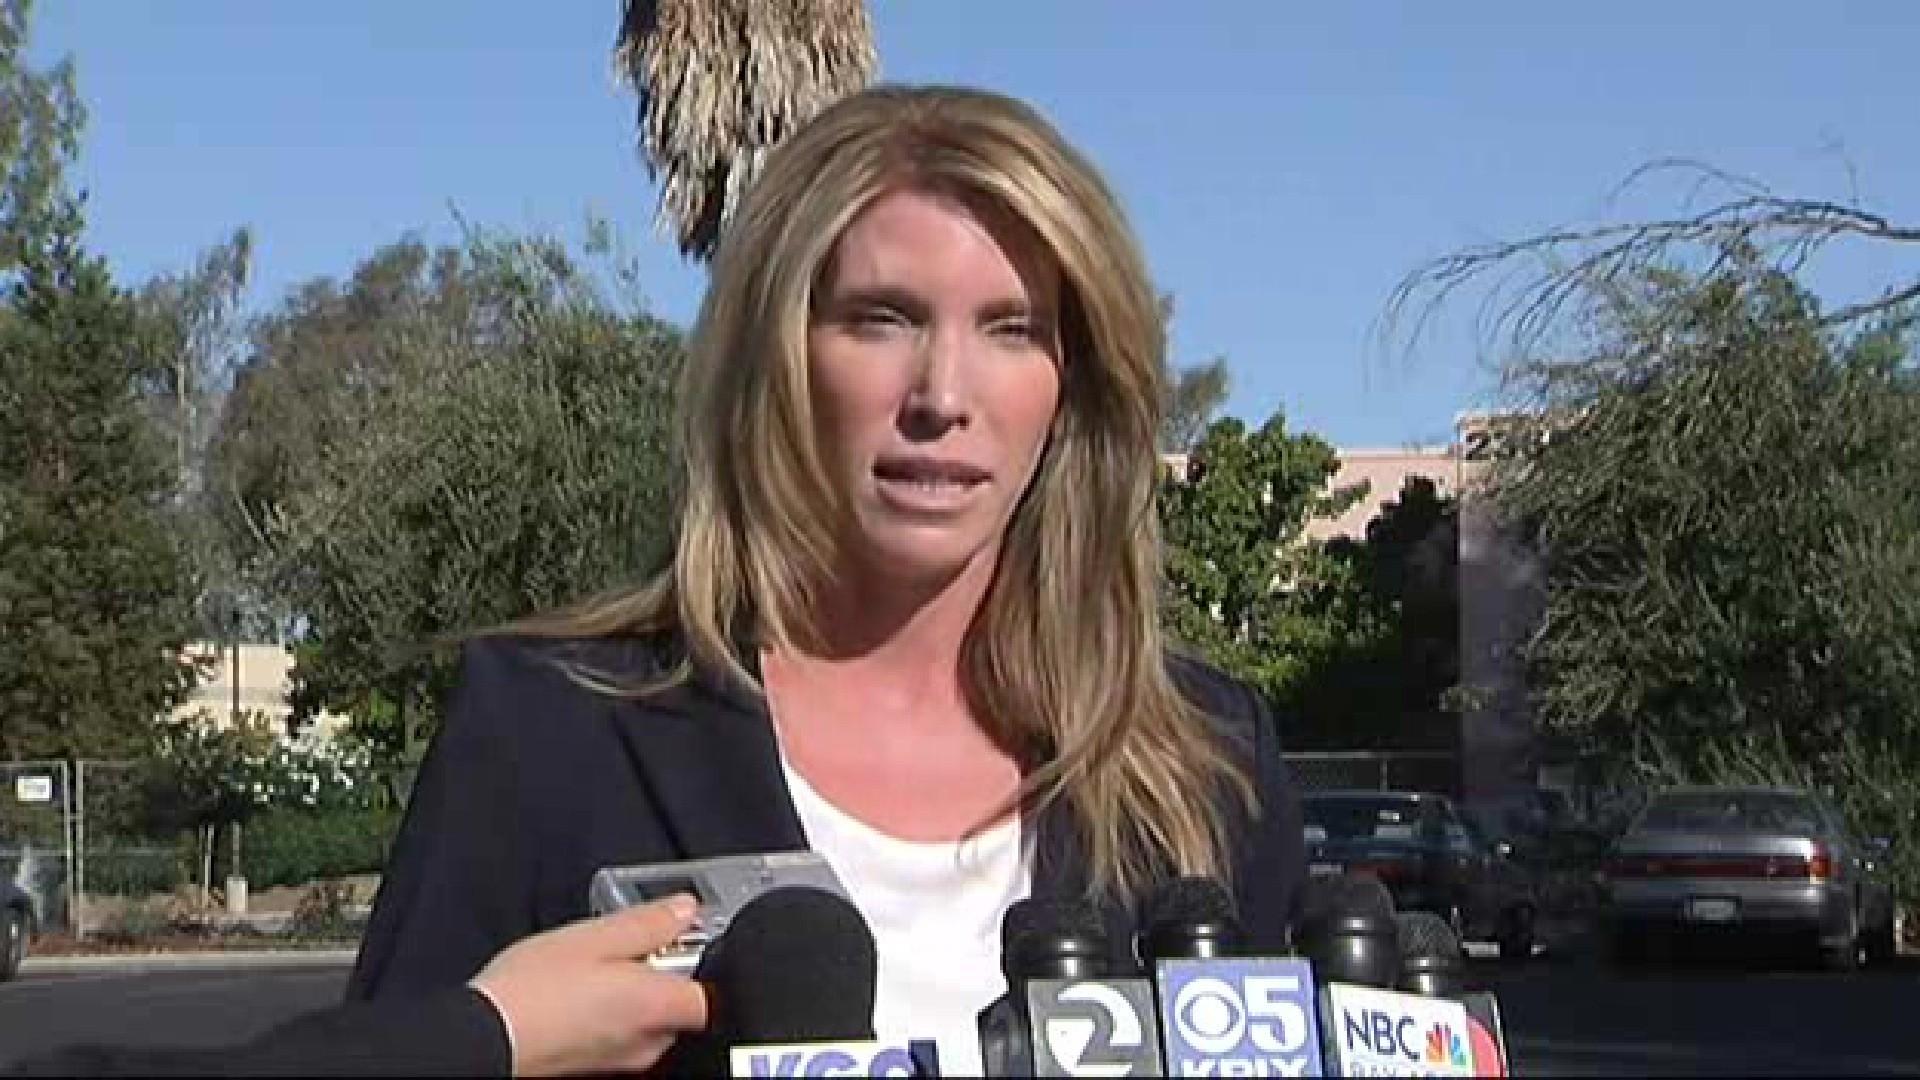 SAN JOSE: Police news conference on small plane landing - LA